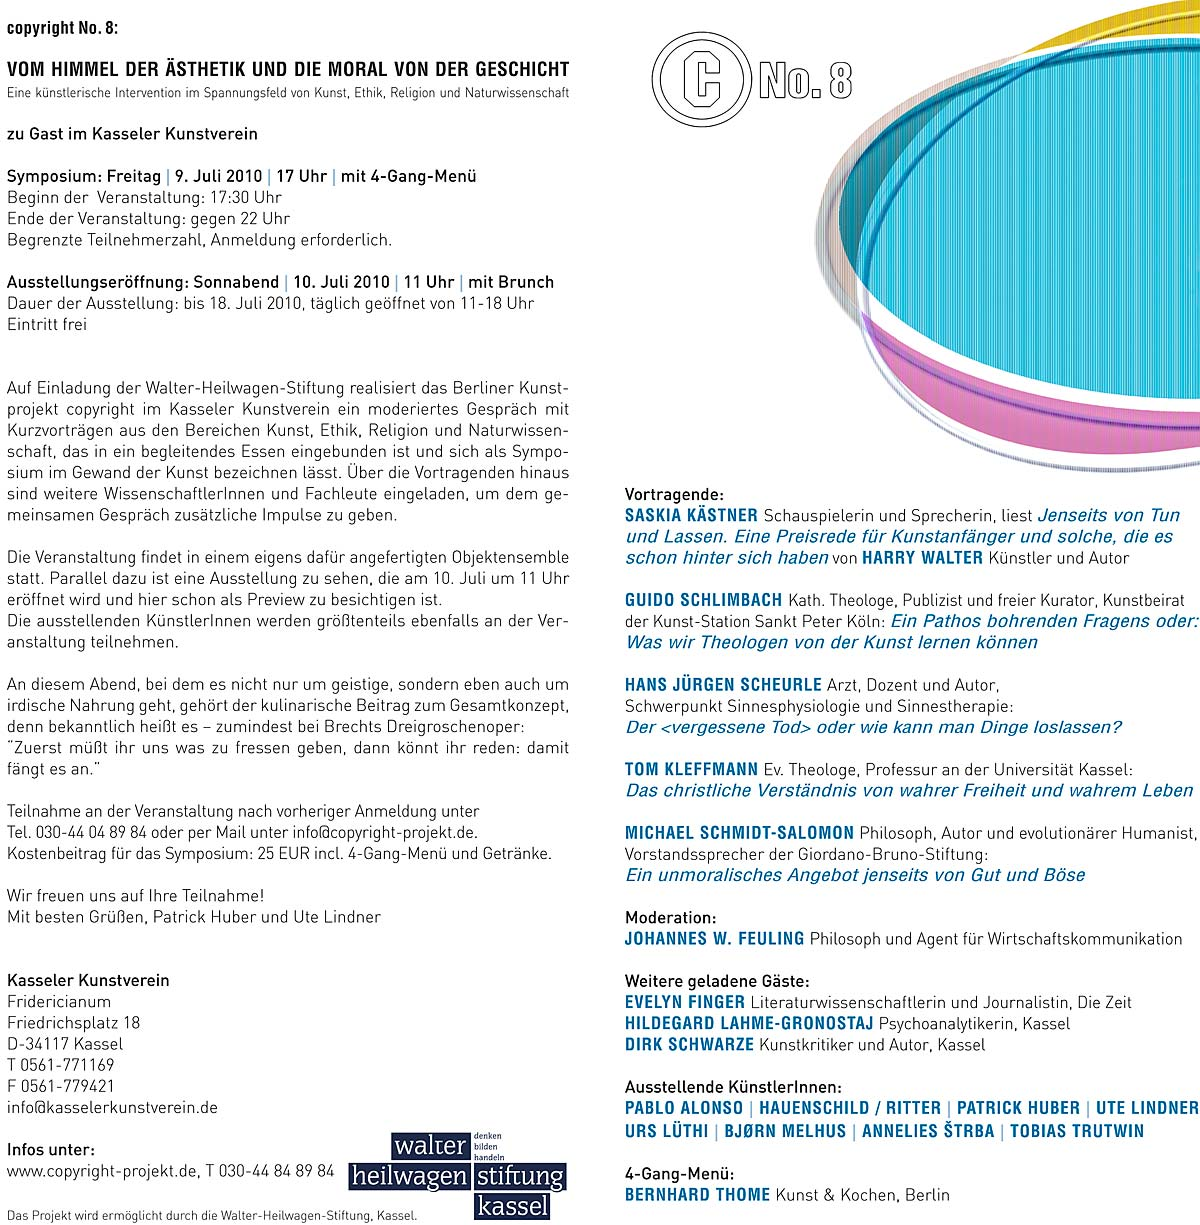 http://www.copyright-projekt.de/images/8/flyer-c8-VomHimmelderAesthetik.jpg